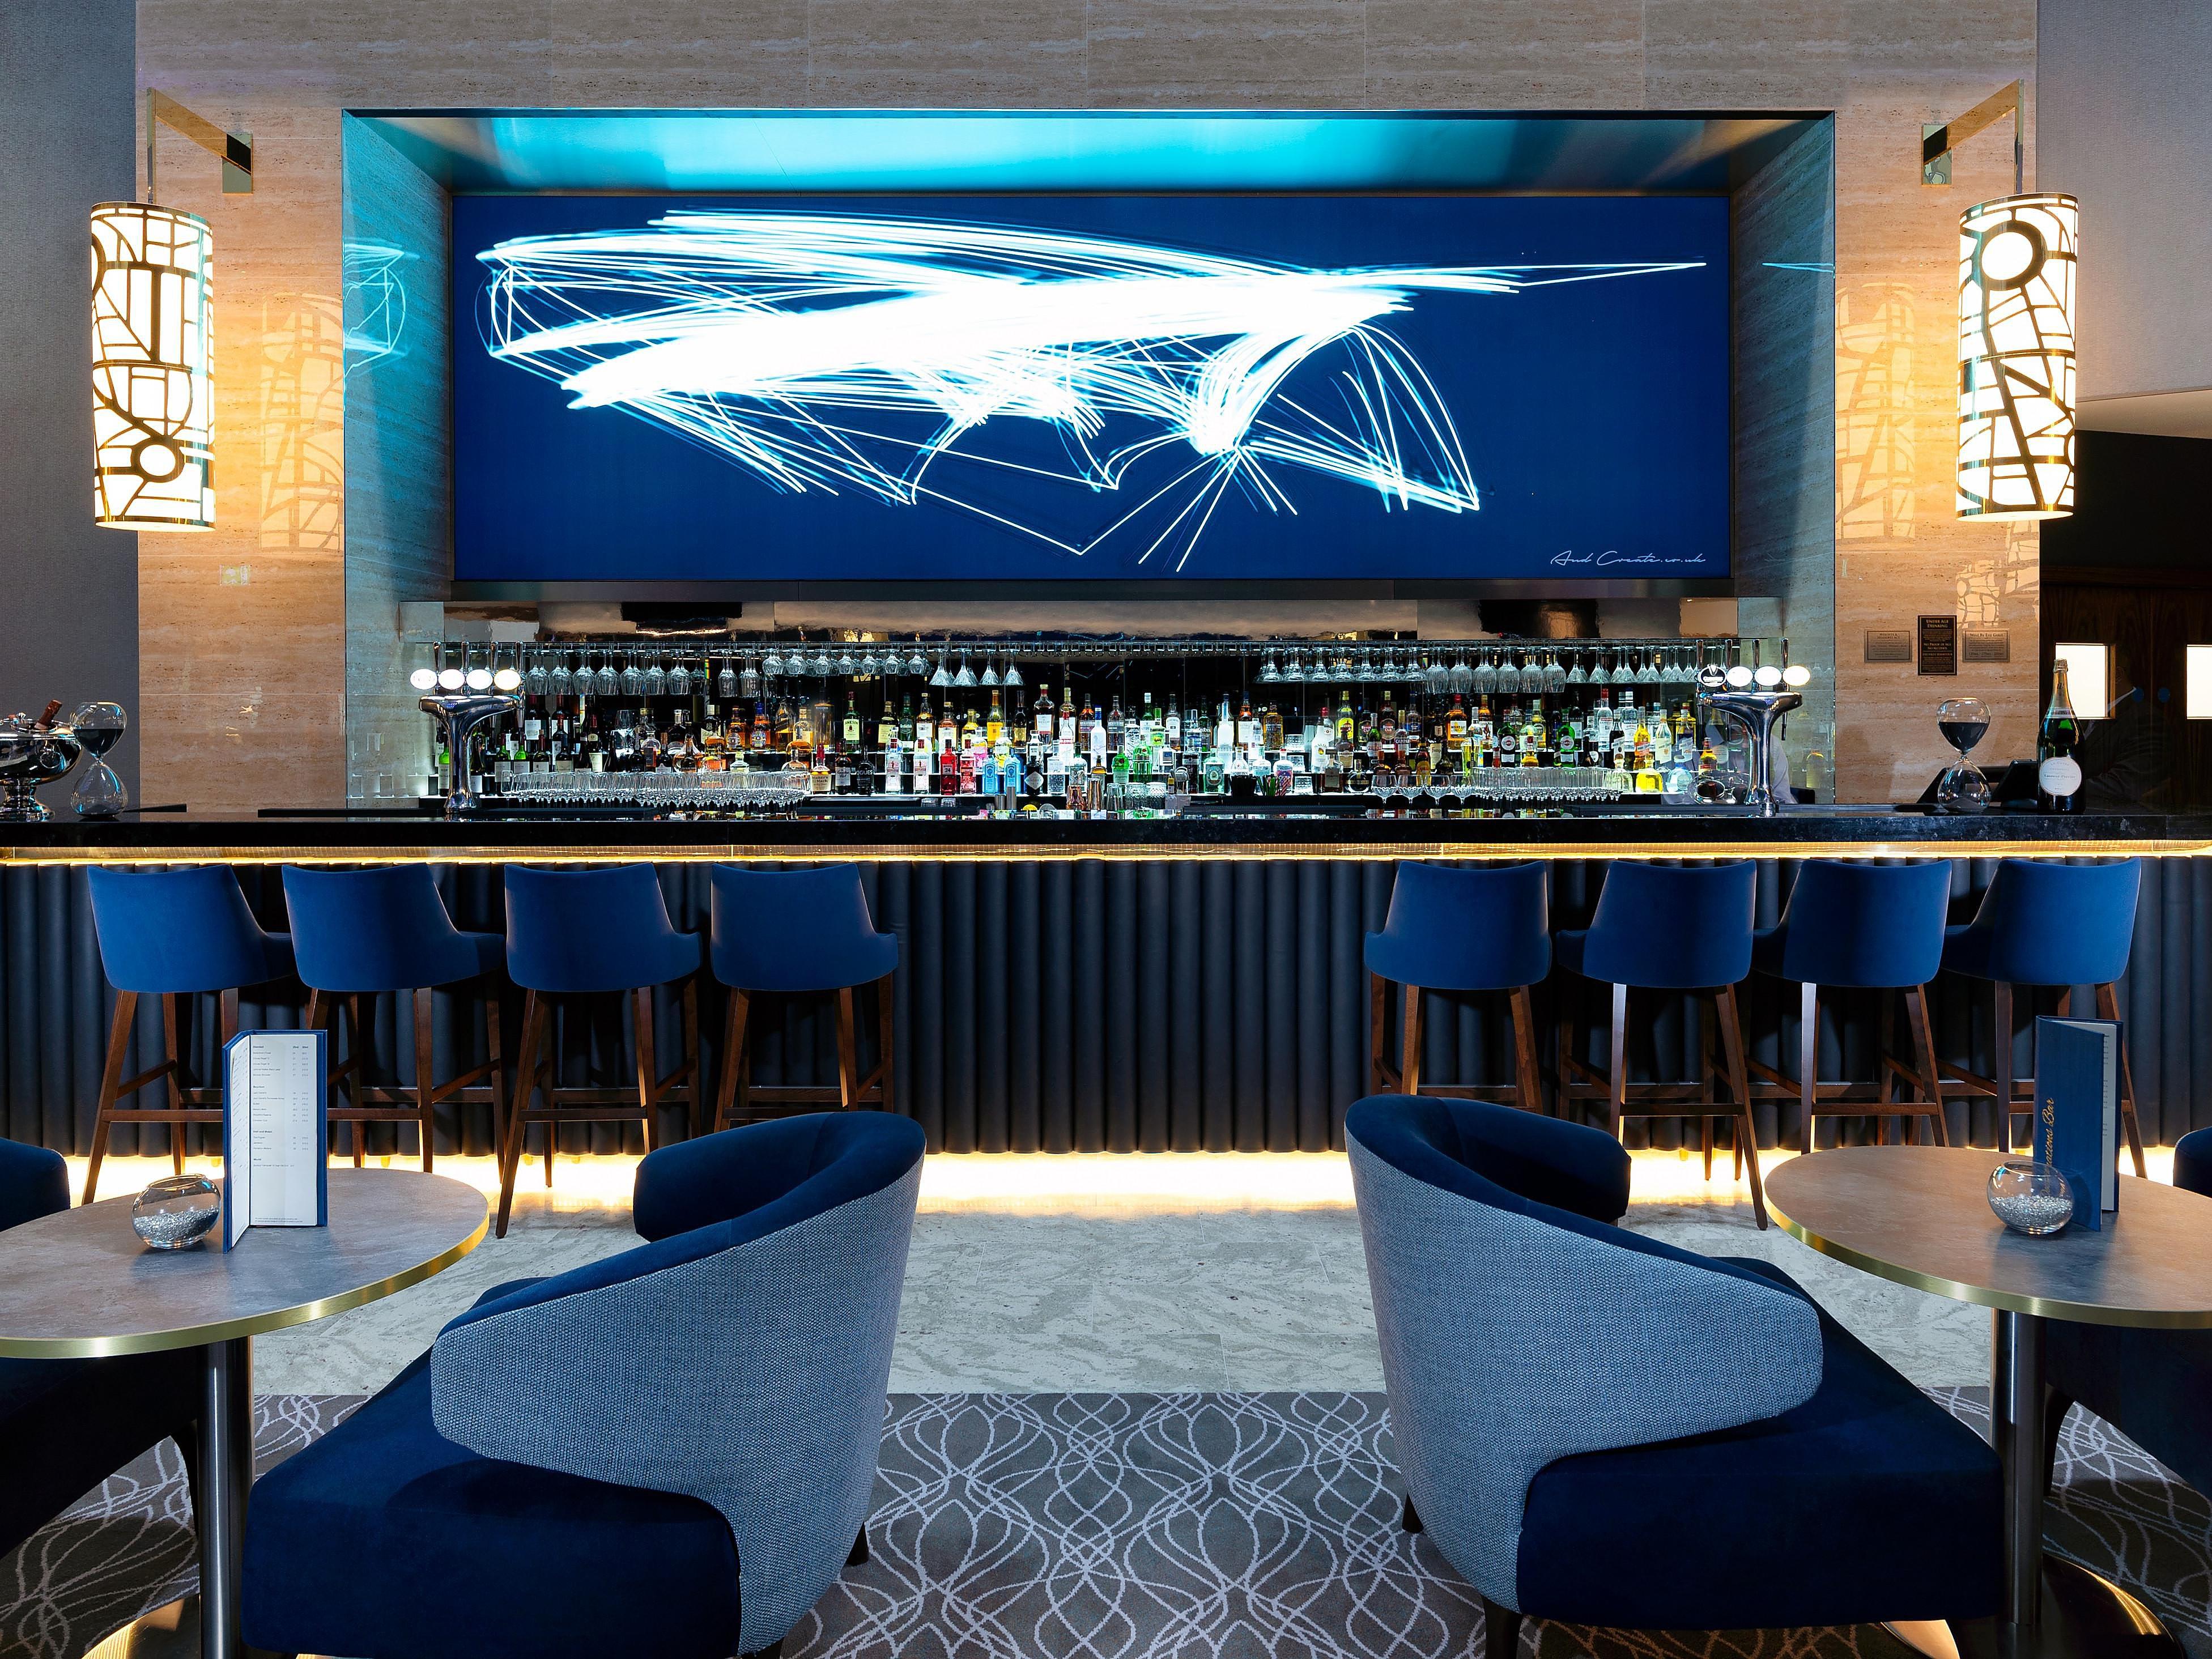 Heathrow Airport Hotels - Terminal 4 | Crowne Plaza London Heathrow T4